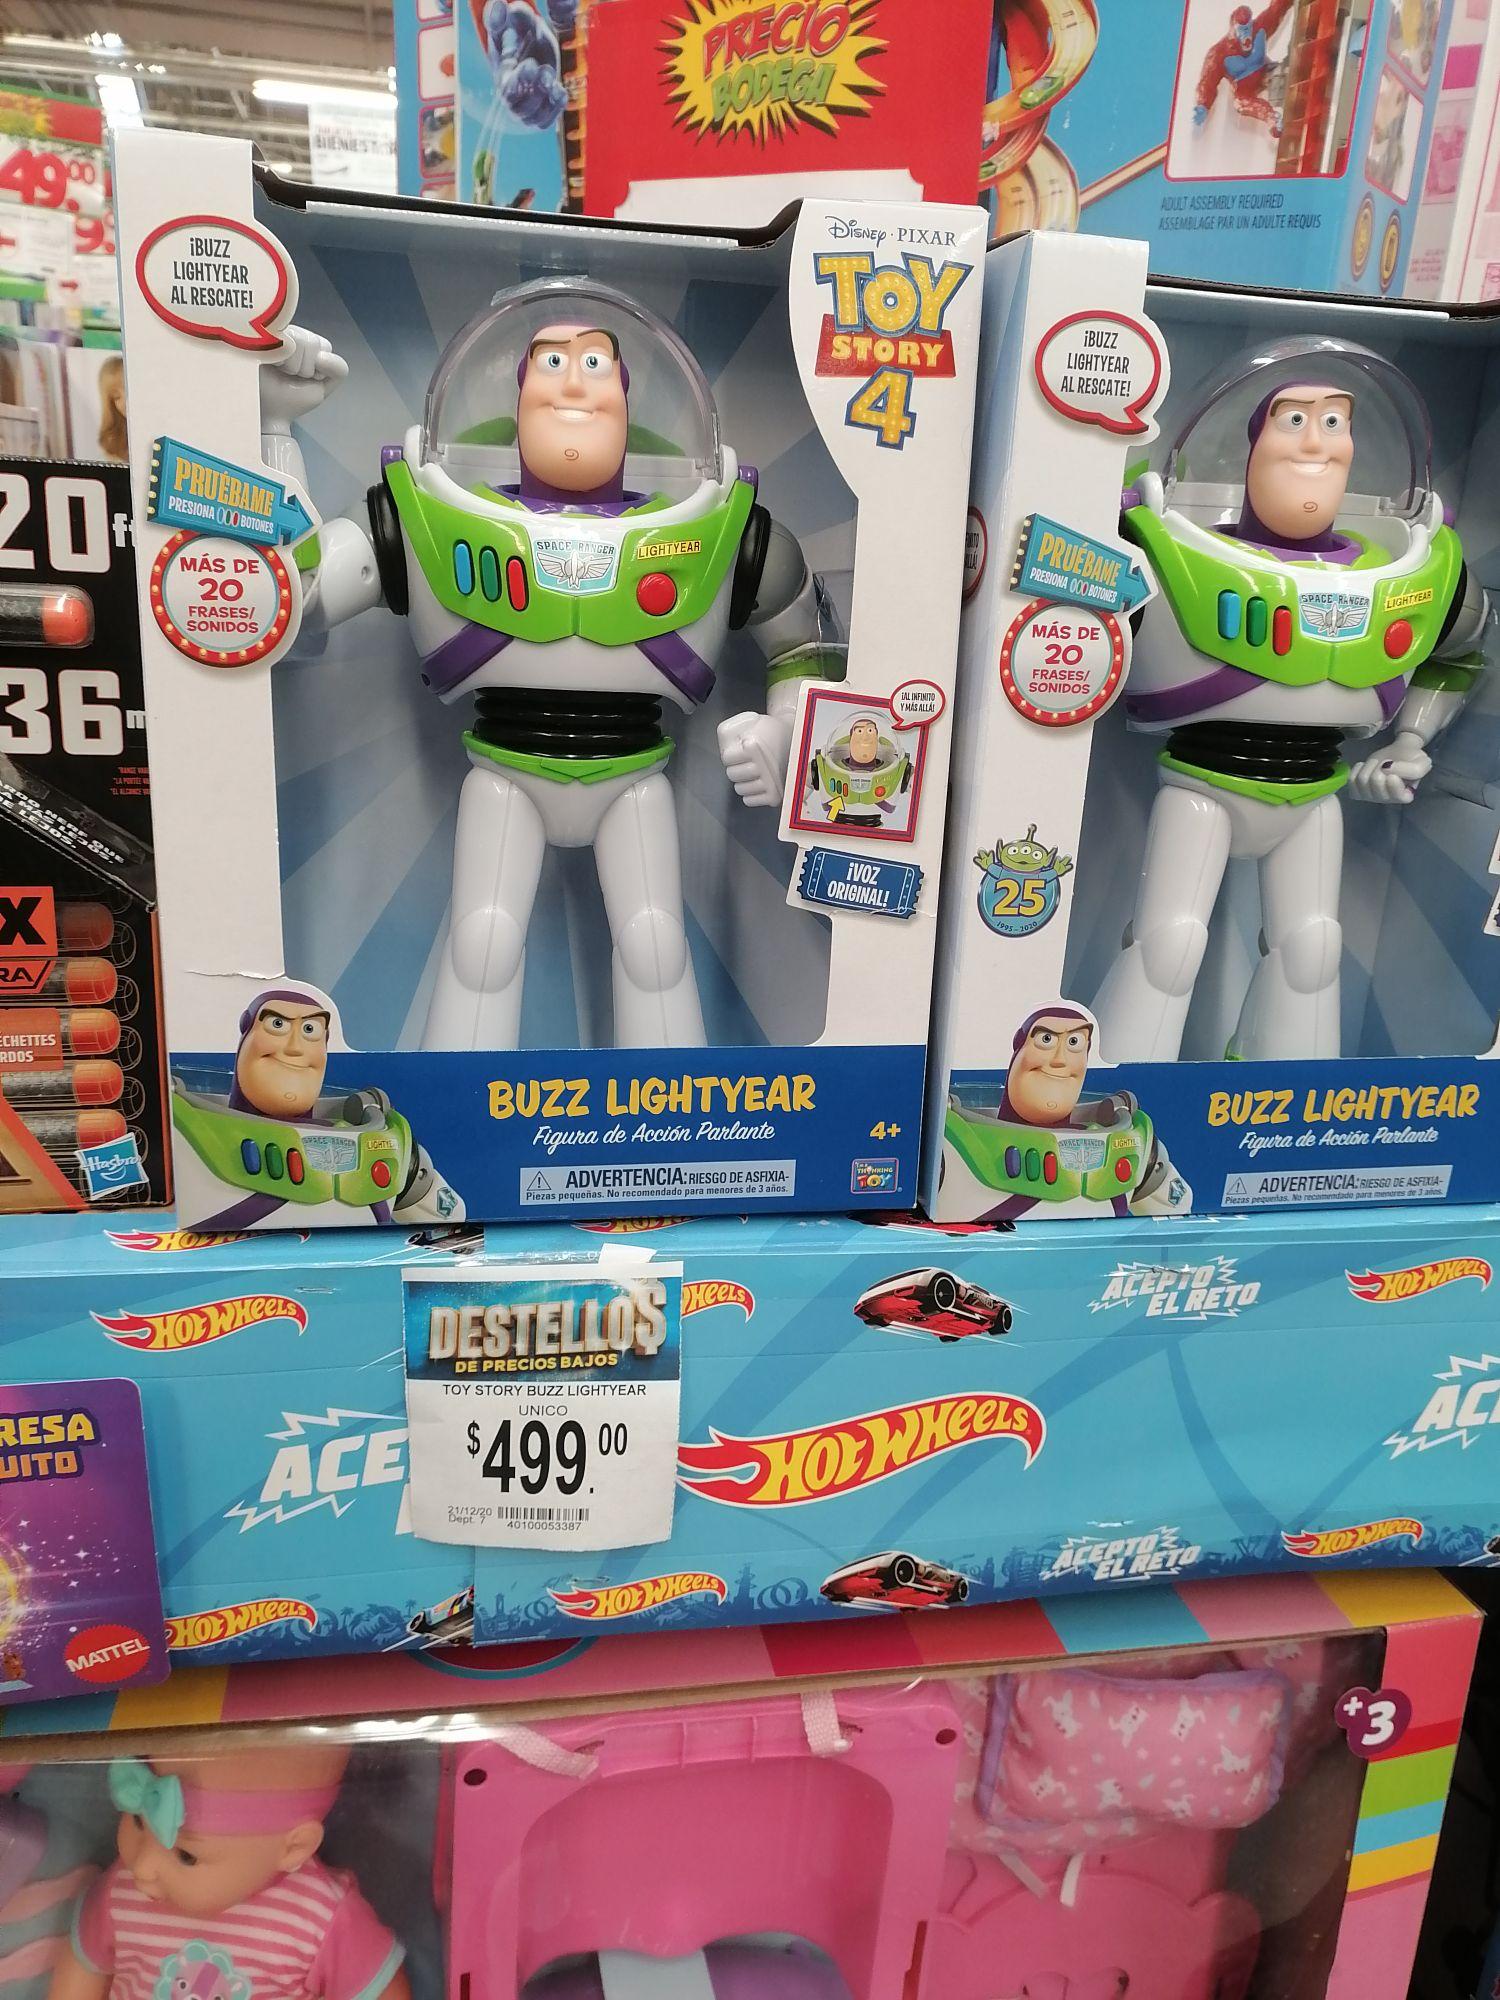 Bodega Aurrera Cuautitlán: Buzz Lightyear